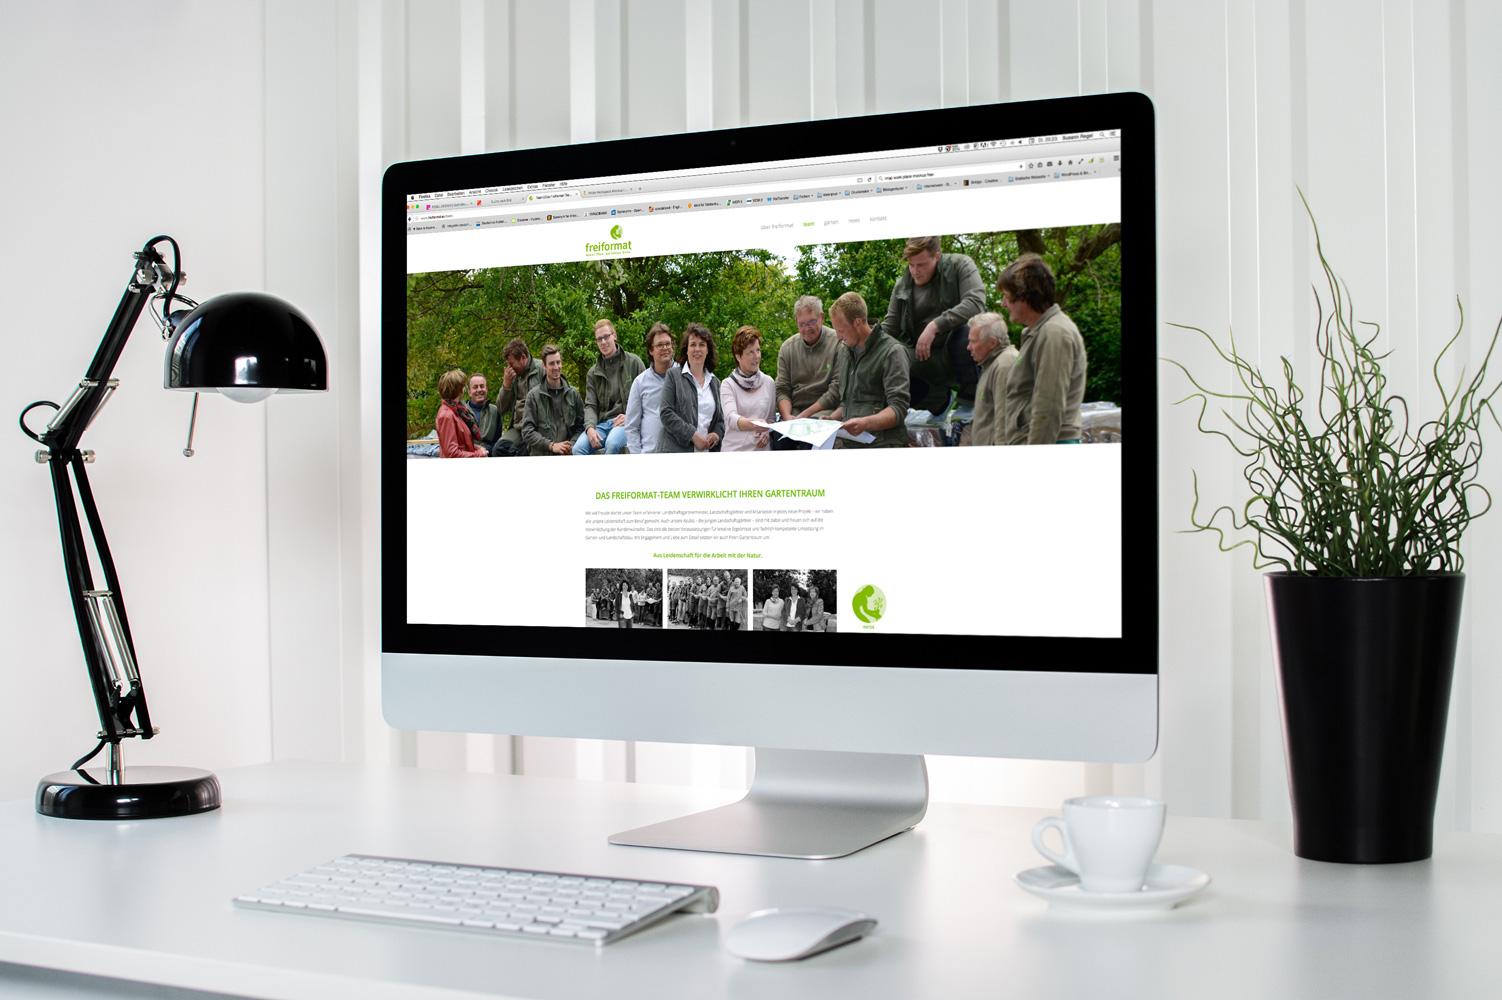 webdesign-regel-design-freiformat-02